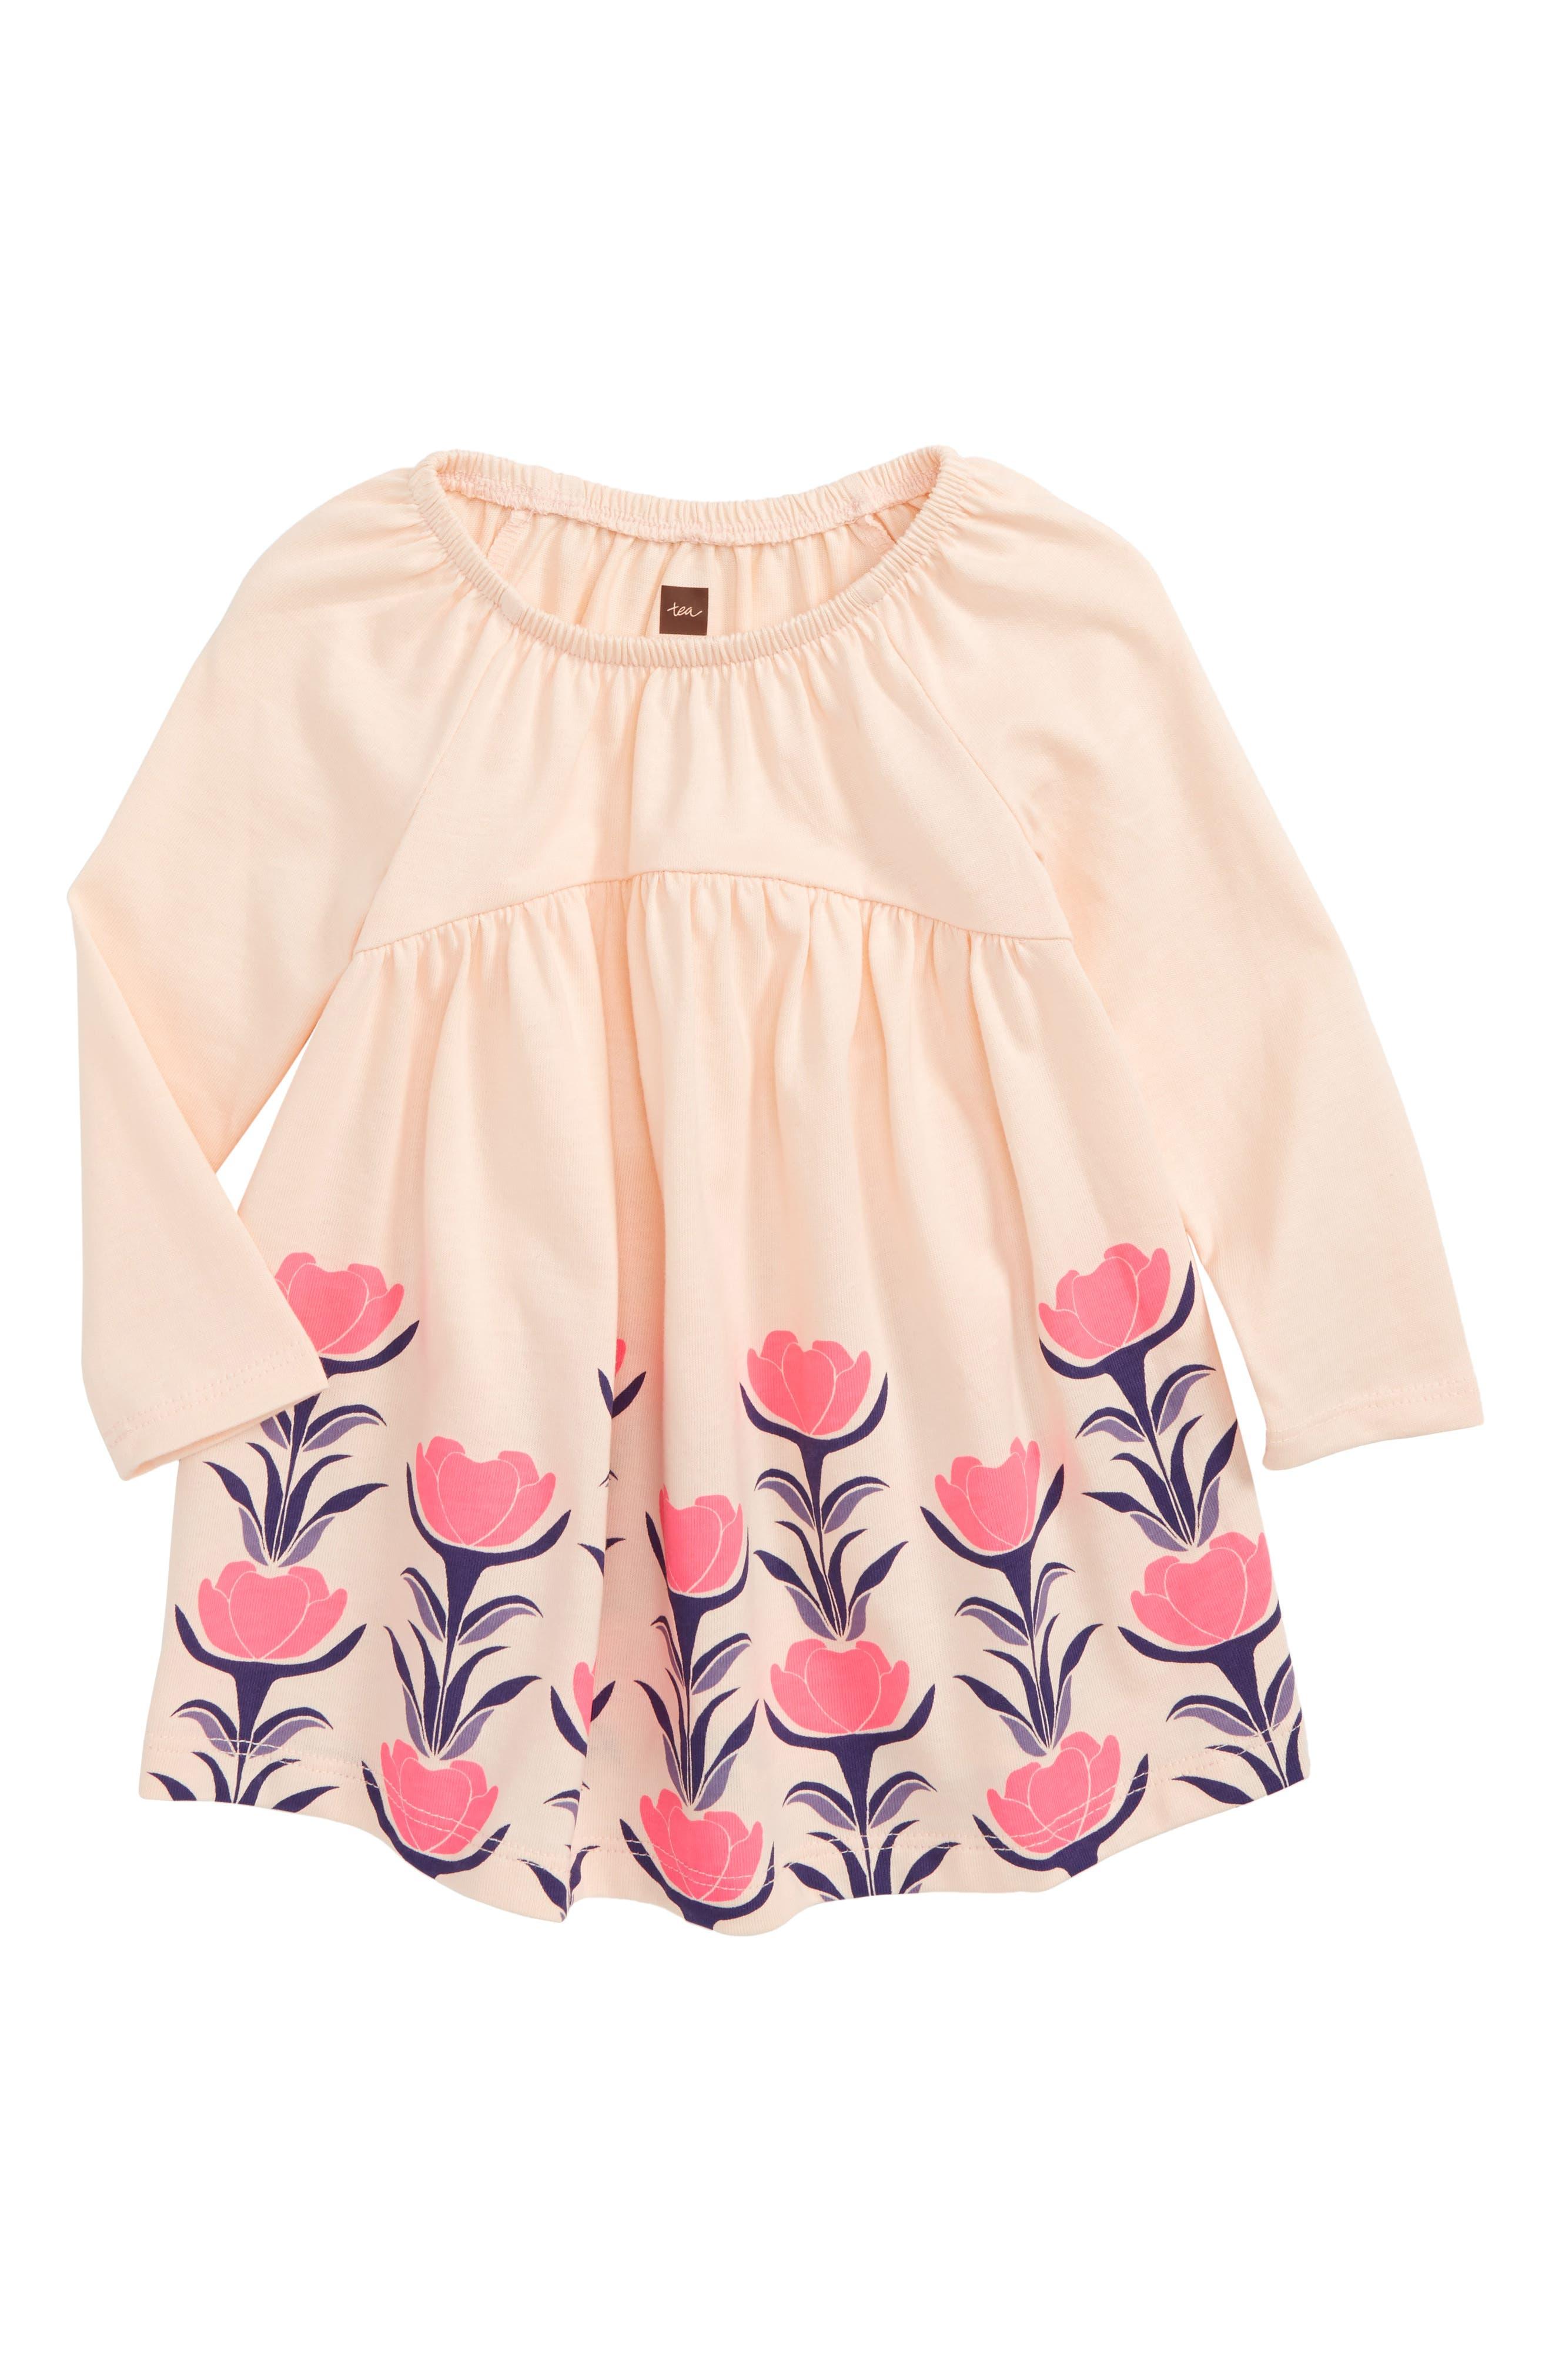 Malin Dress,                         Main,                         color, Soft Peach